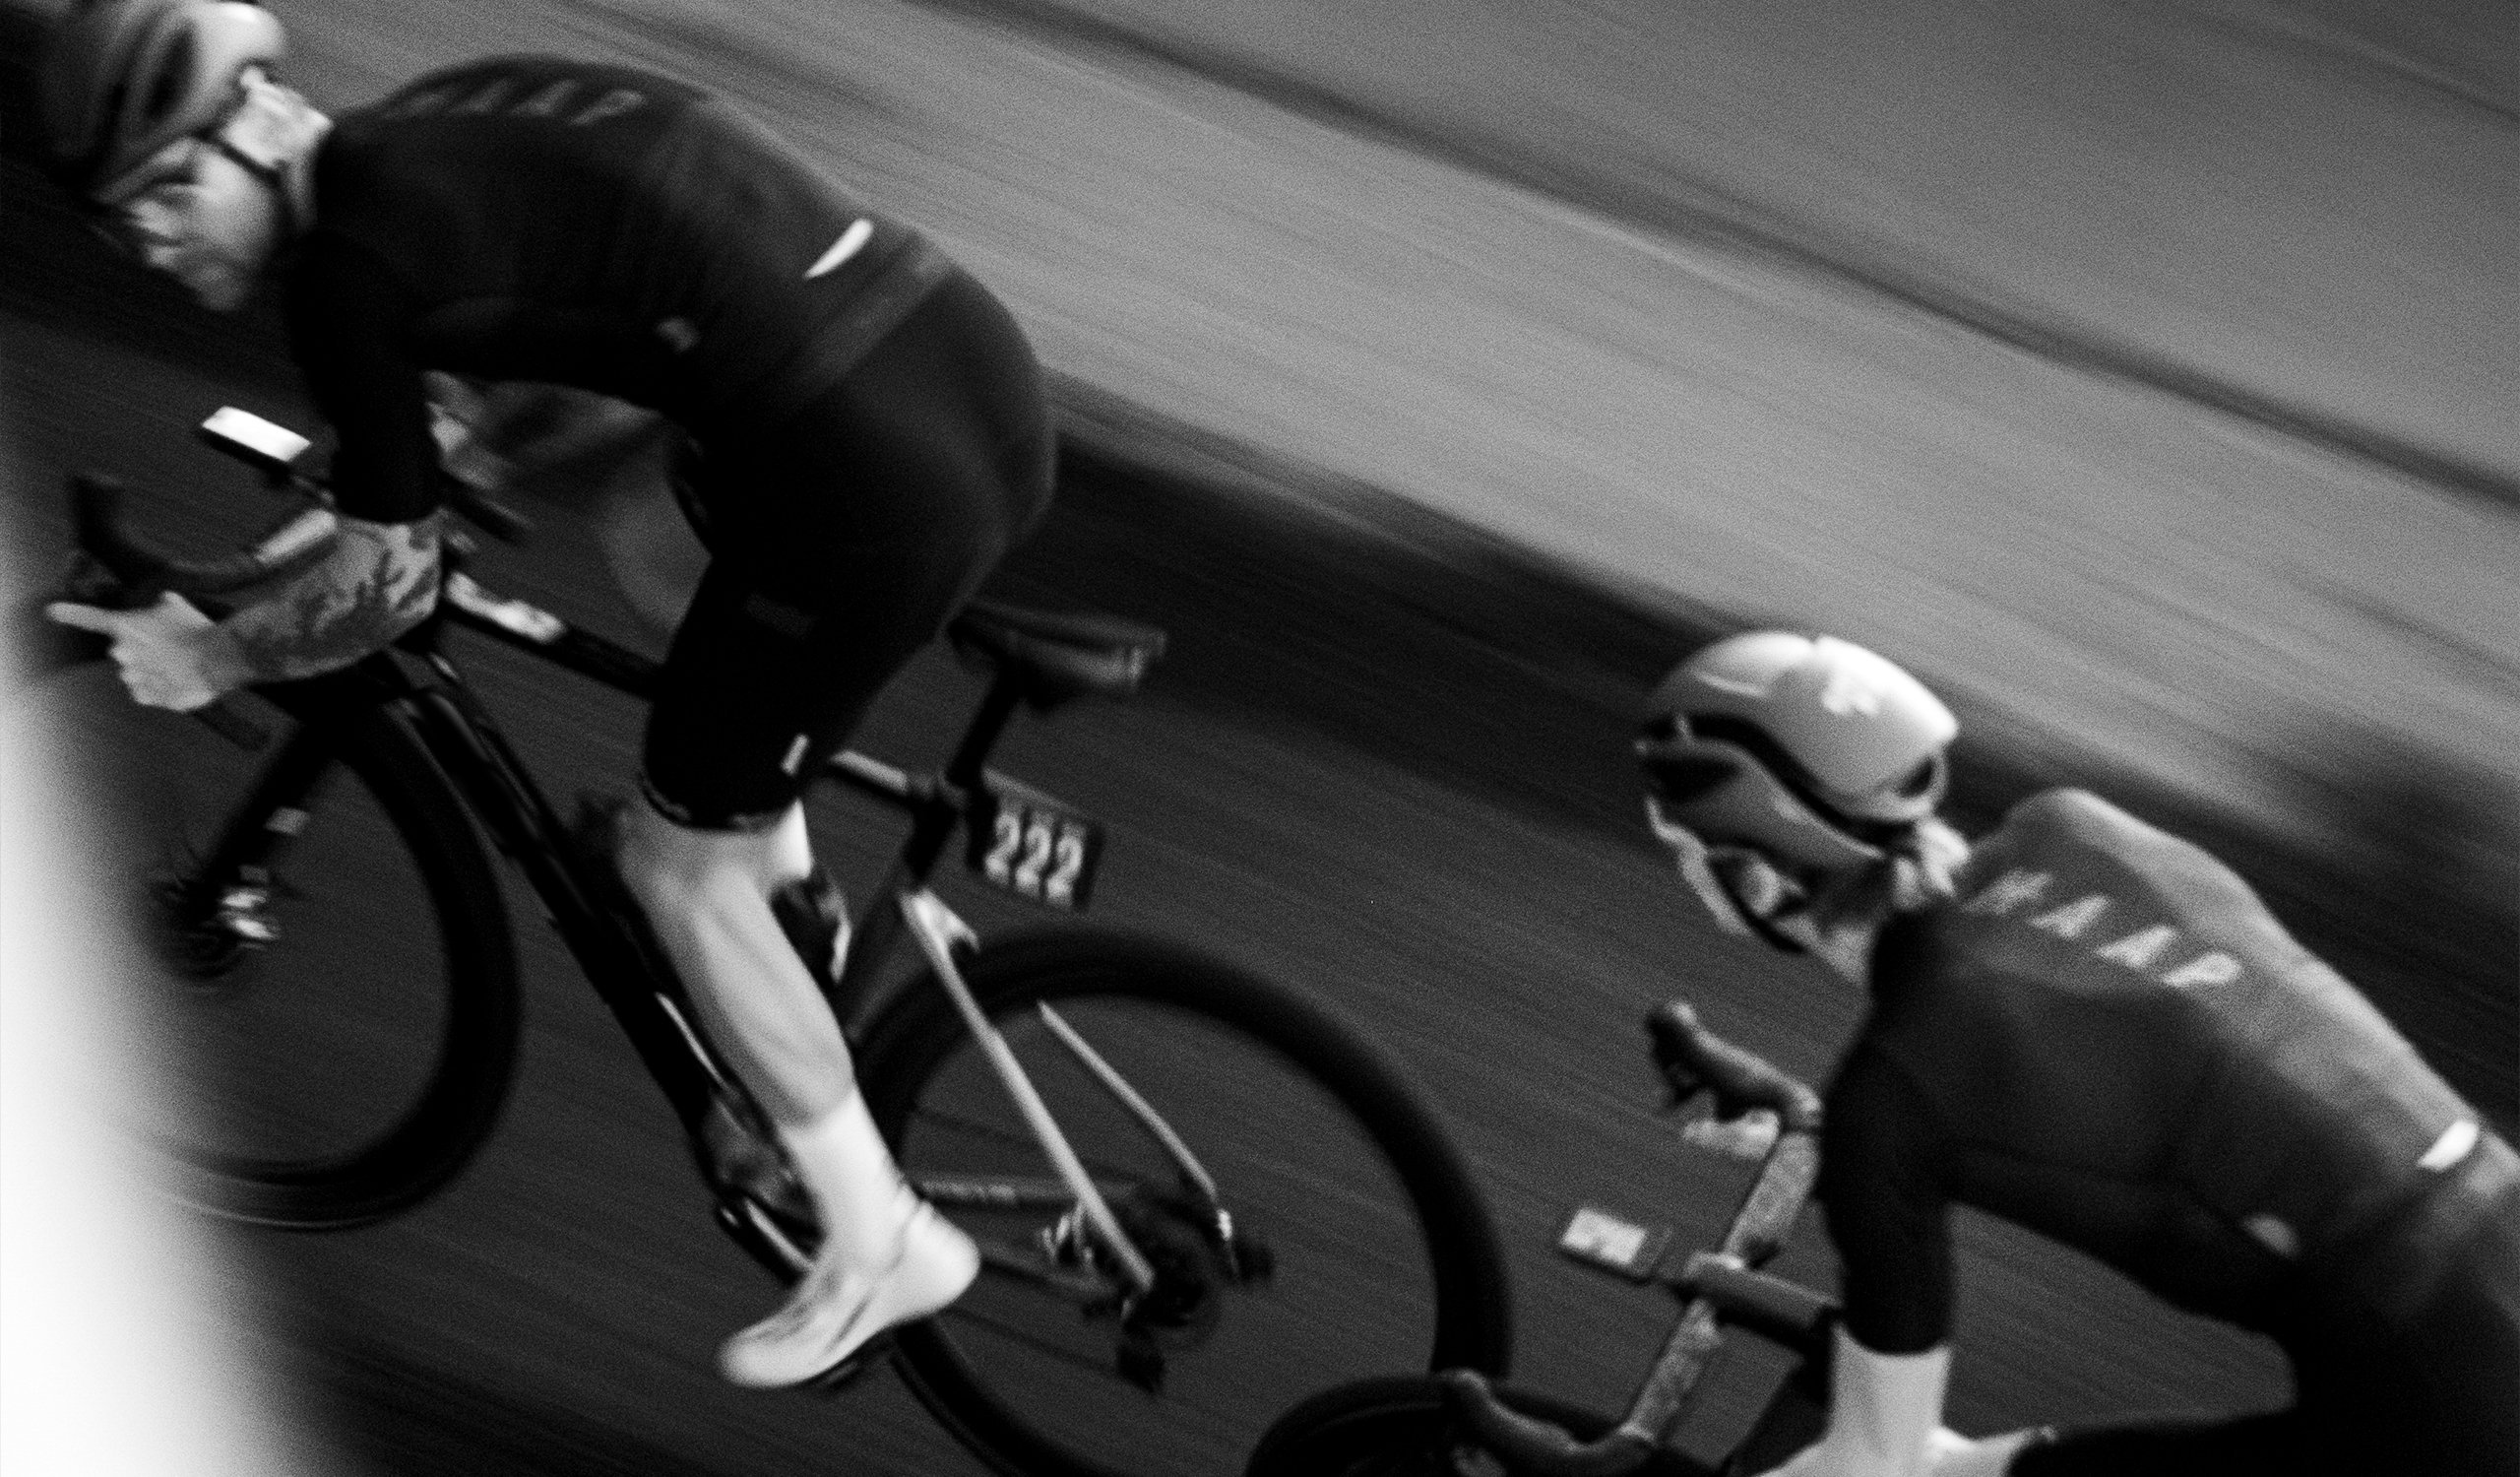 Men's Stealth Race Fit Jersey / Grey